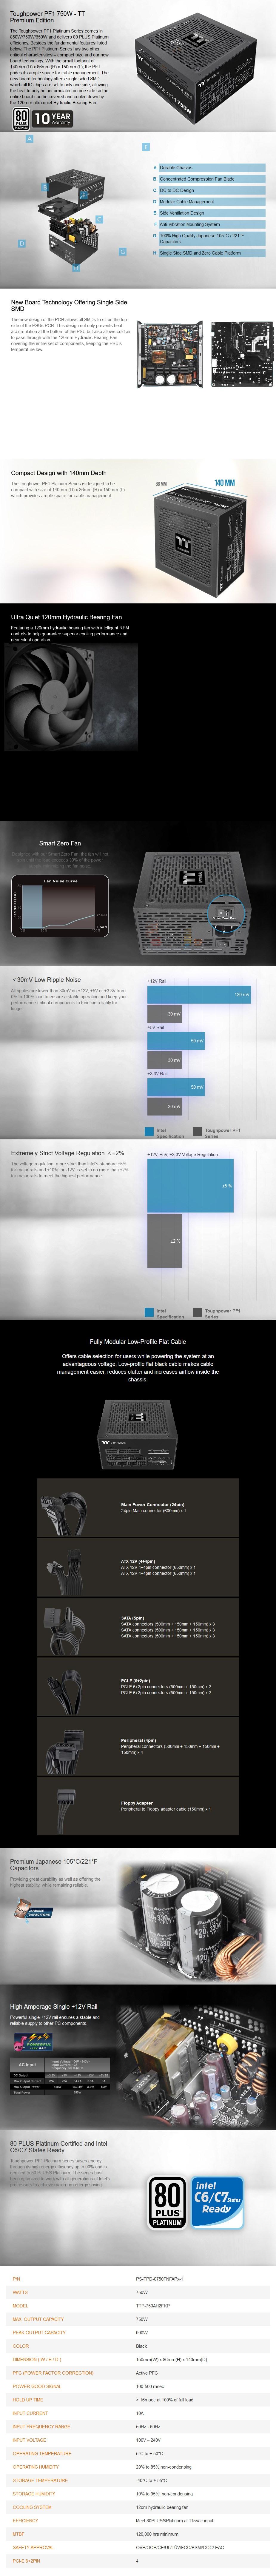 thermaltake-toughpower-pf1-750w-80-platinum-fully-modular-power-supply-ac36156-5.jpg